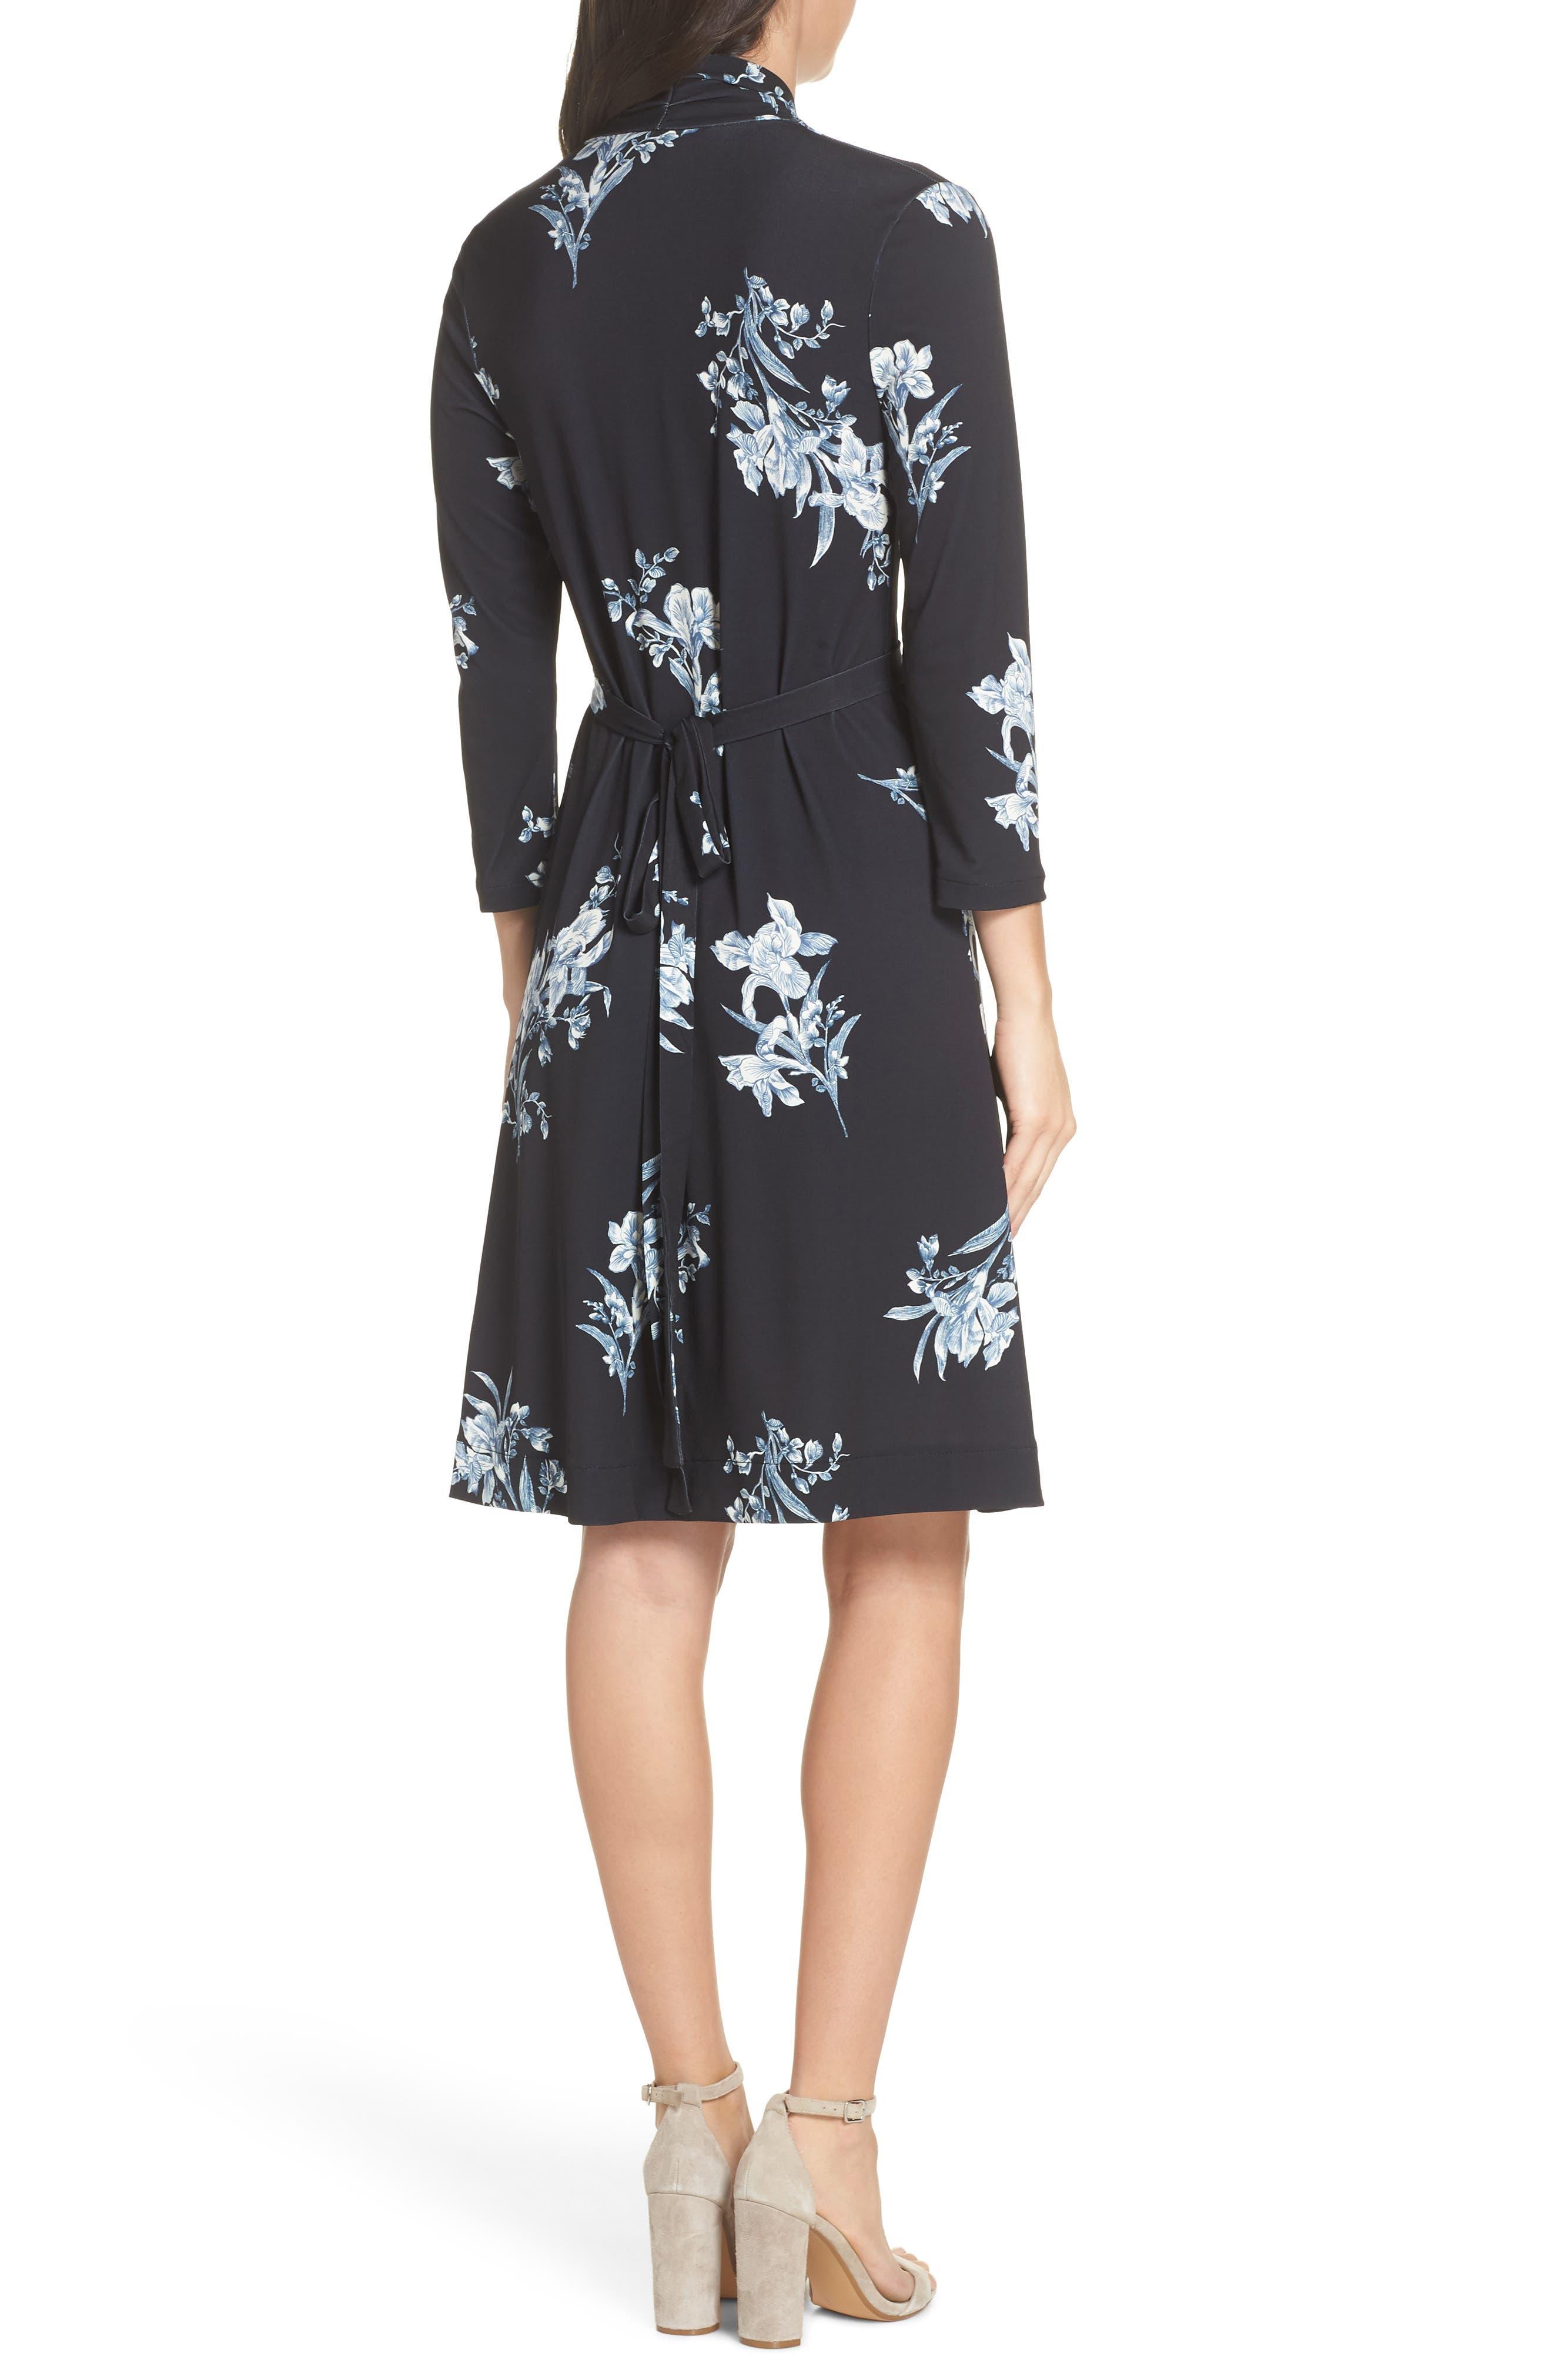 FRENCH CONNECTION, Laila Floral Print Dress, Alternate thumbnail 2, color, BLACK MULTI